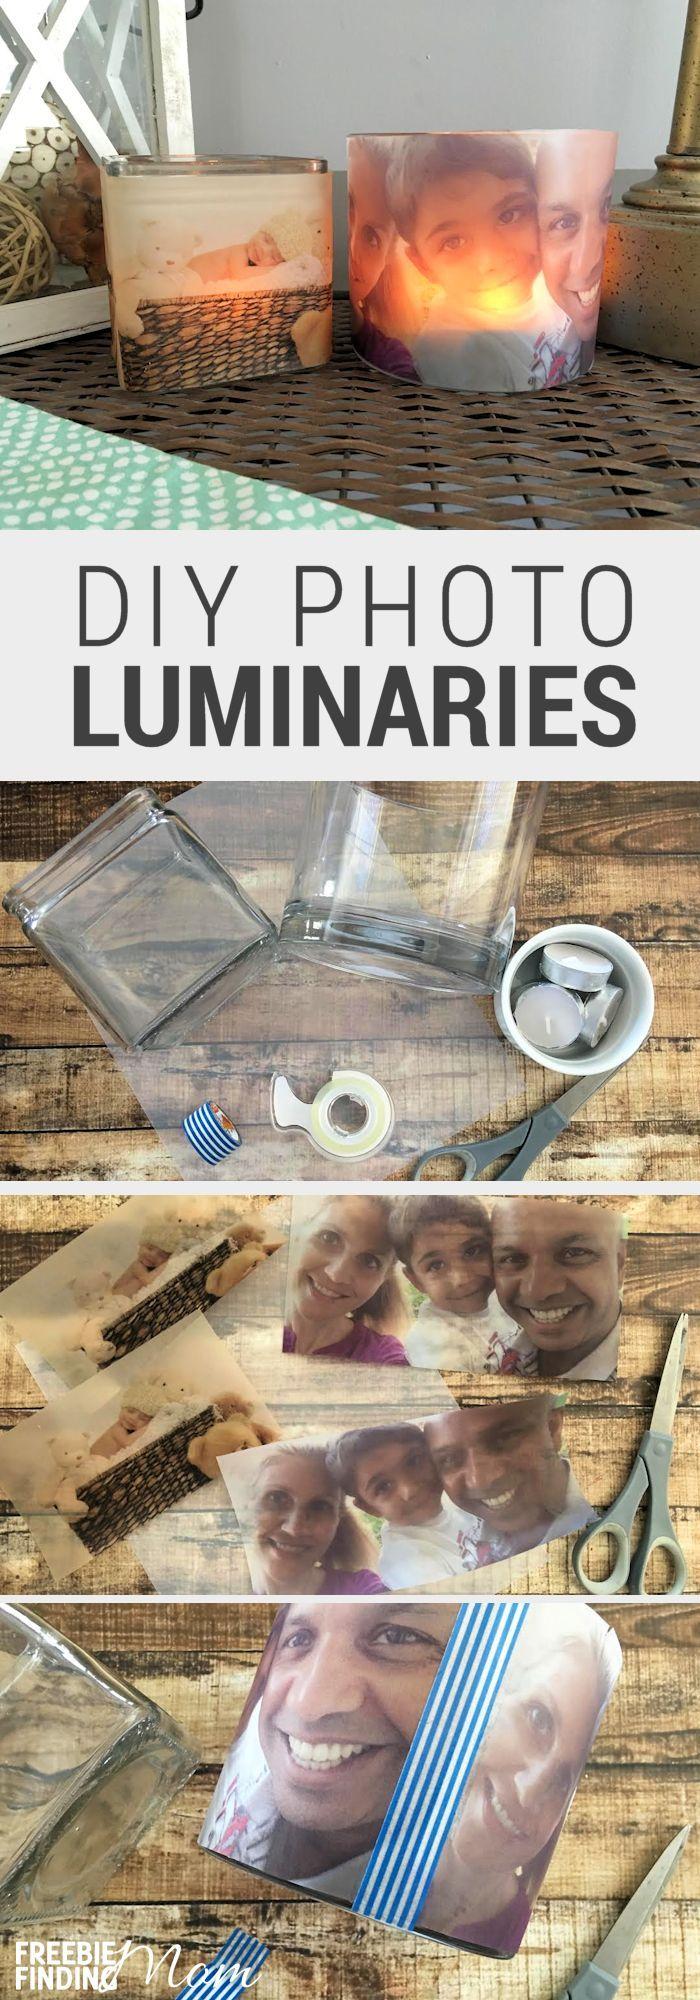 Easy Homemade Photo Gifts: Glowing Photo Luminaries